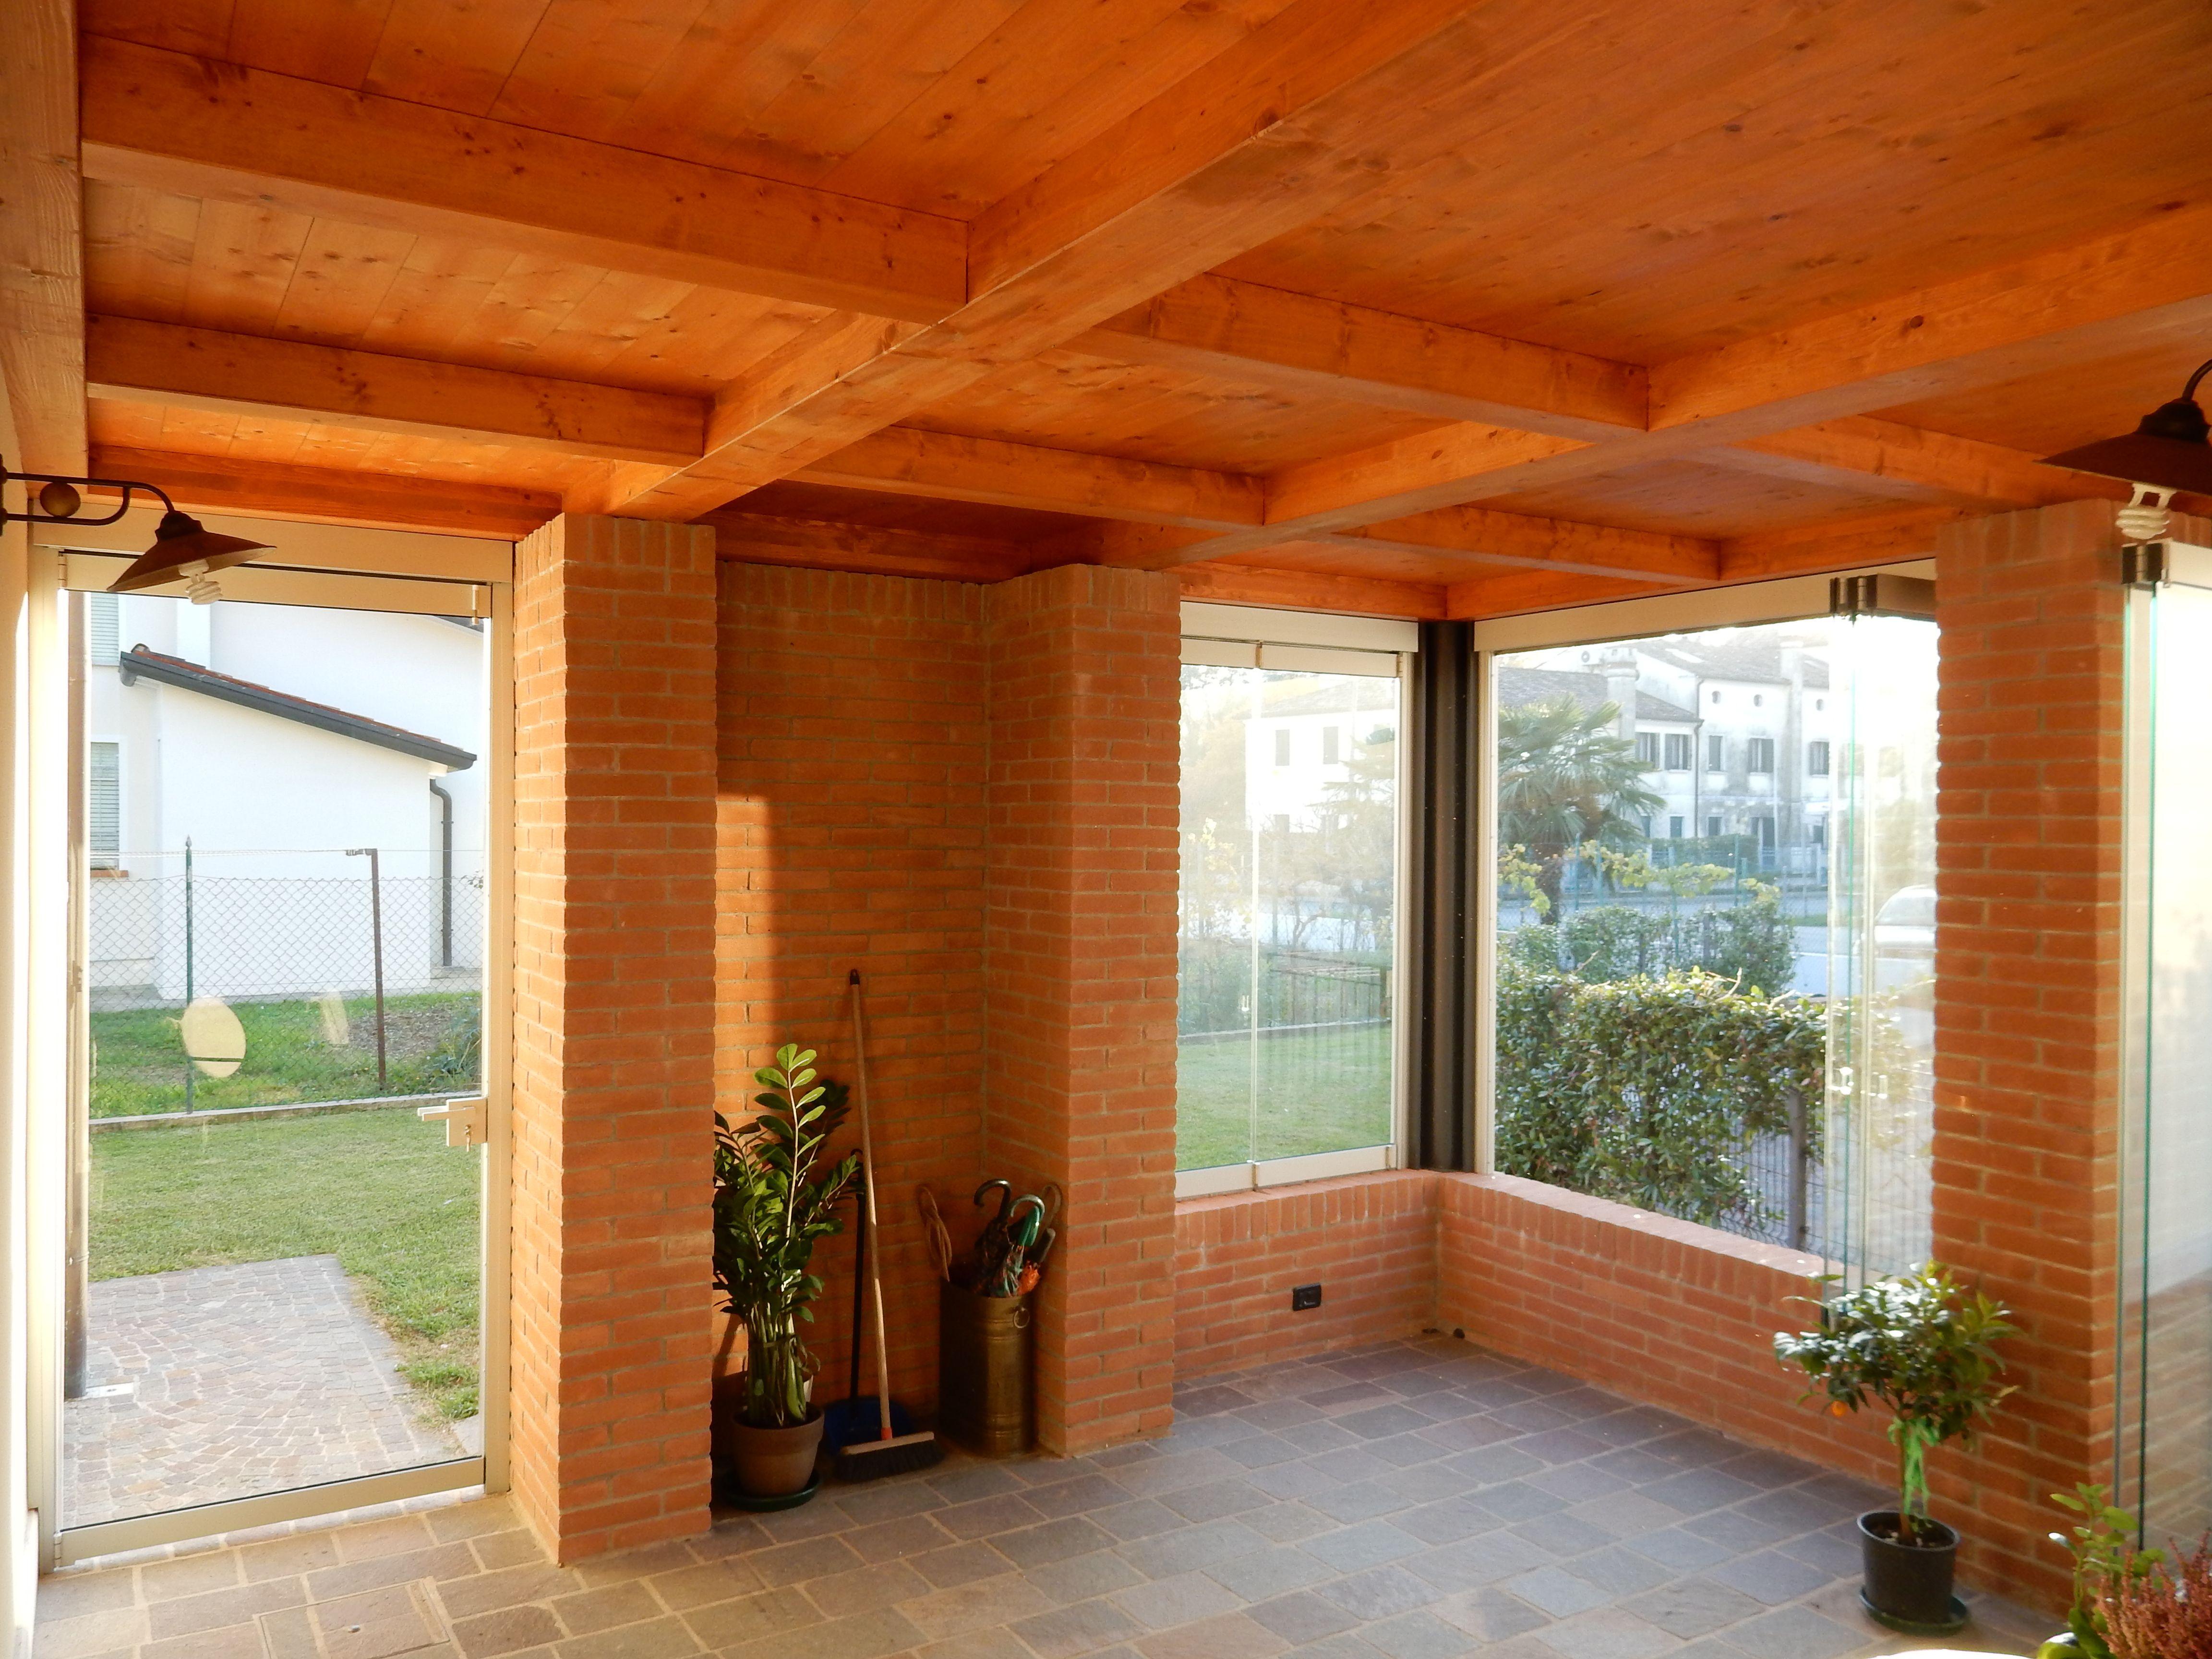 Verande Chiuse Per Giardino Mobili Per Veranda Chiusa Interessante